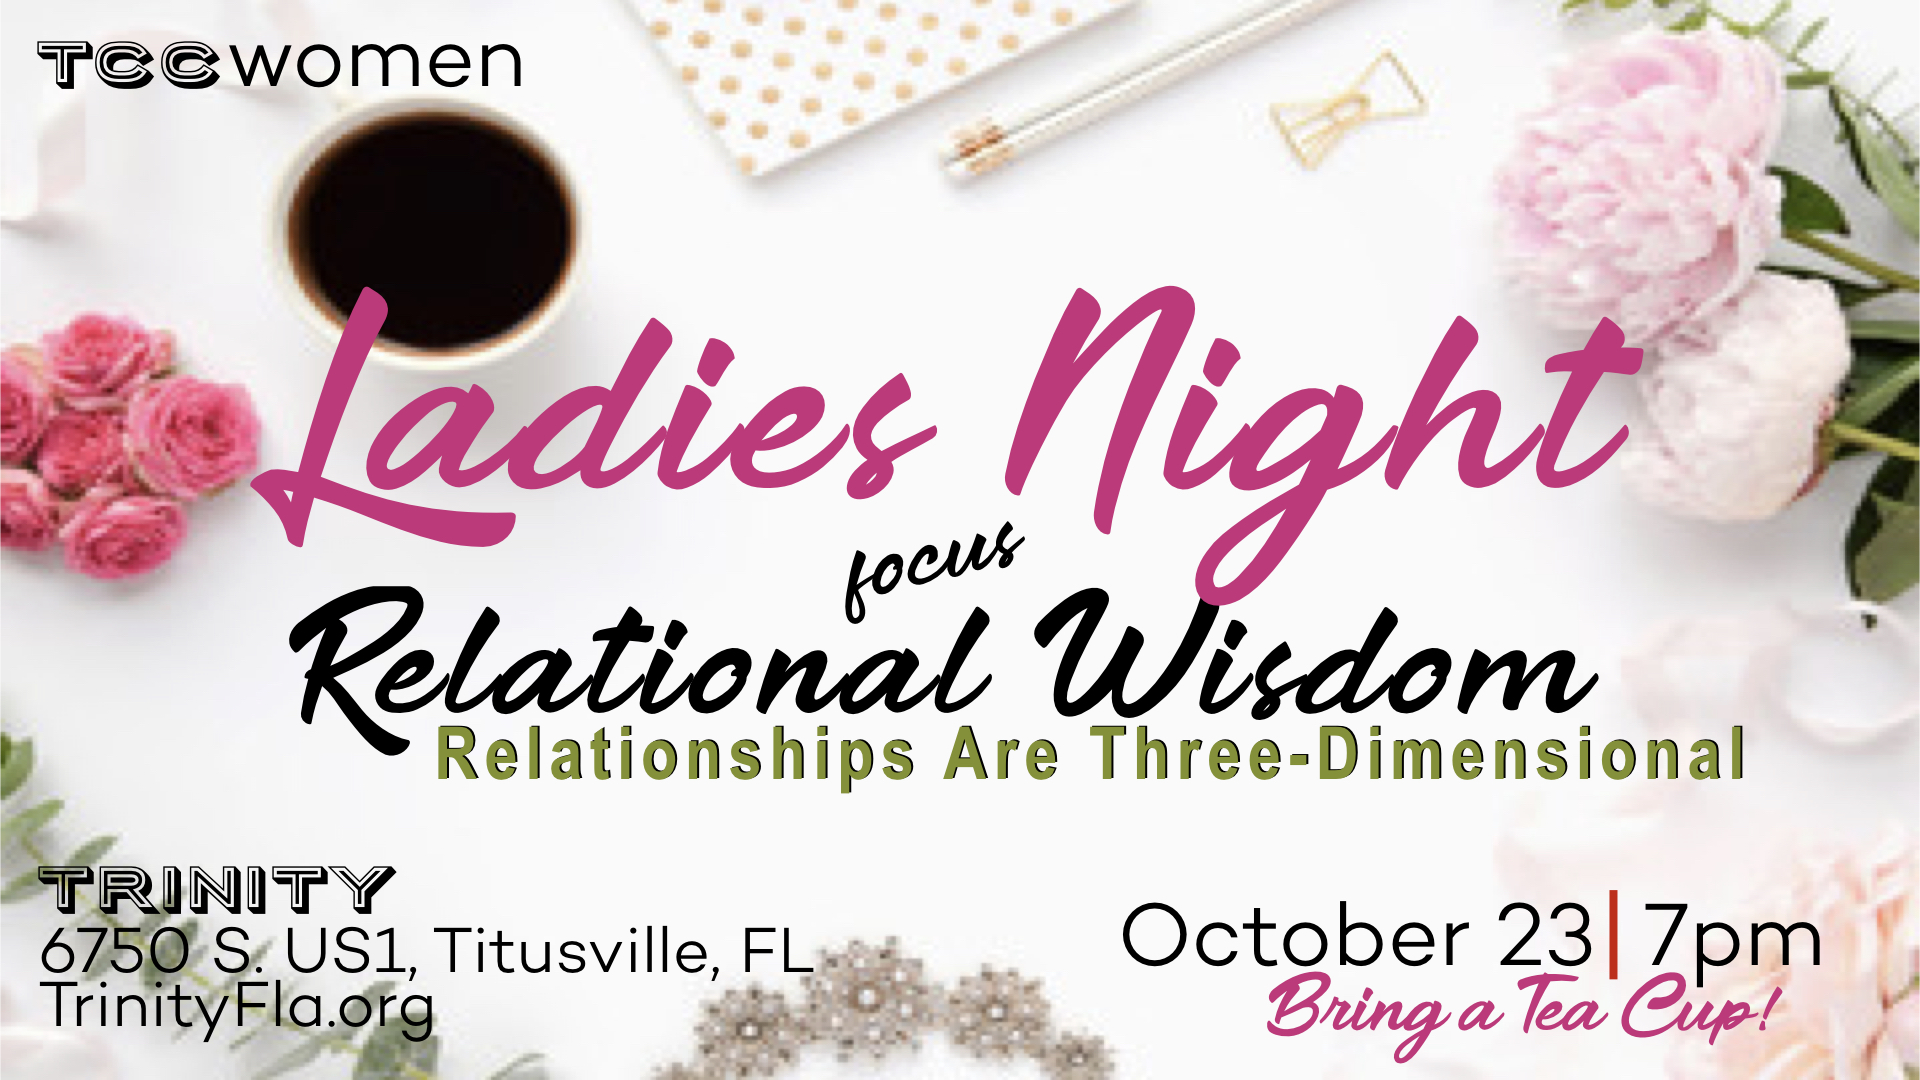 TCC Graphics - Ladies Night.001.jpeg